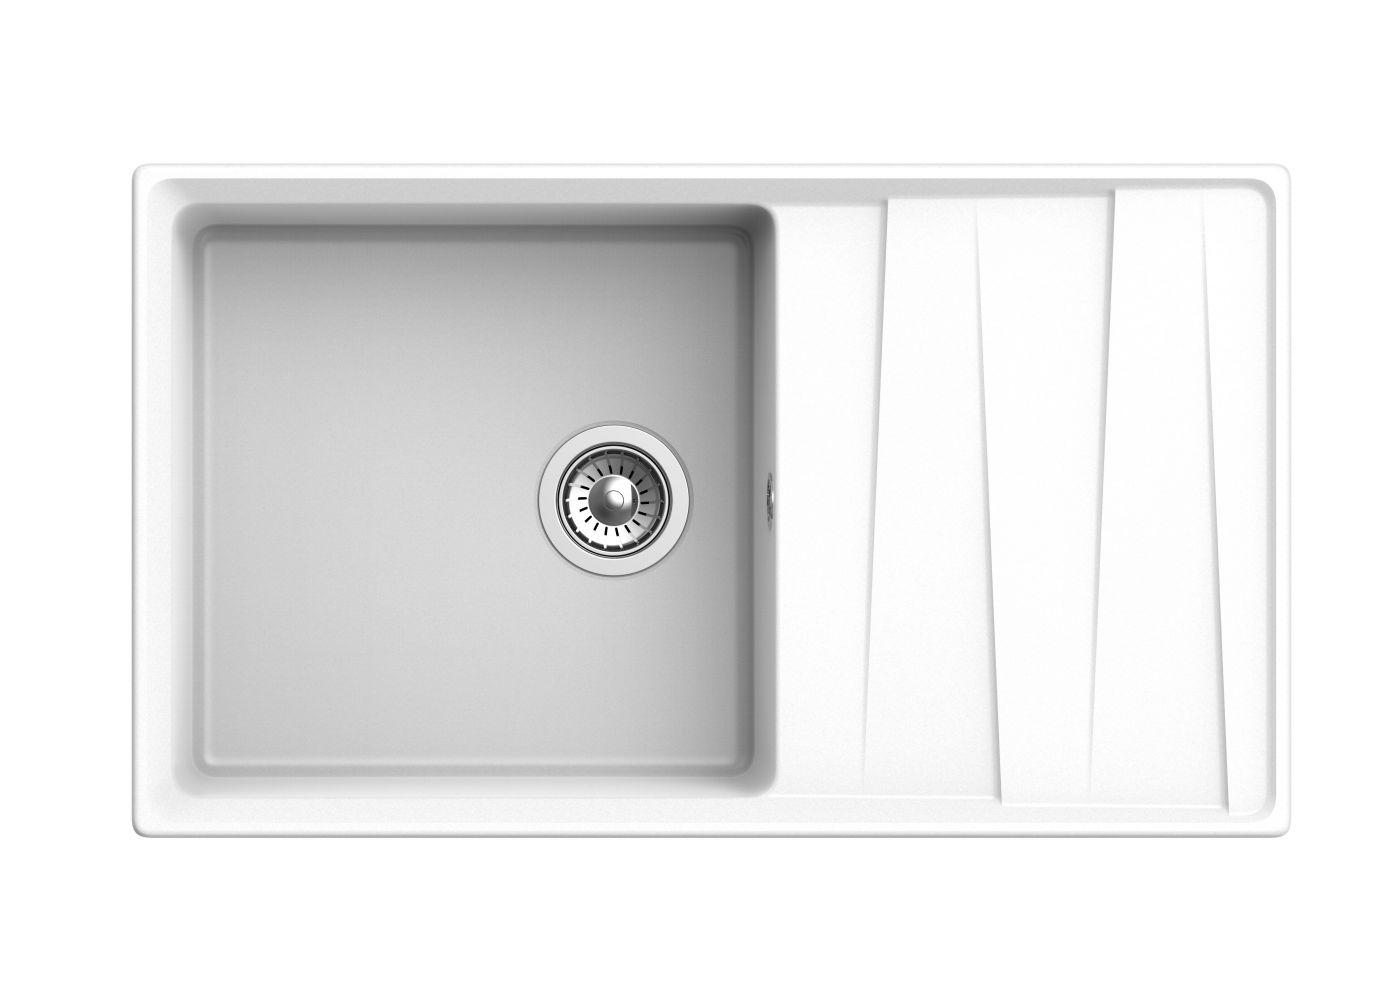 Мраморная мойка для кухни GranFest Level GF-LV860L Иней